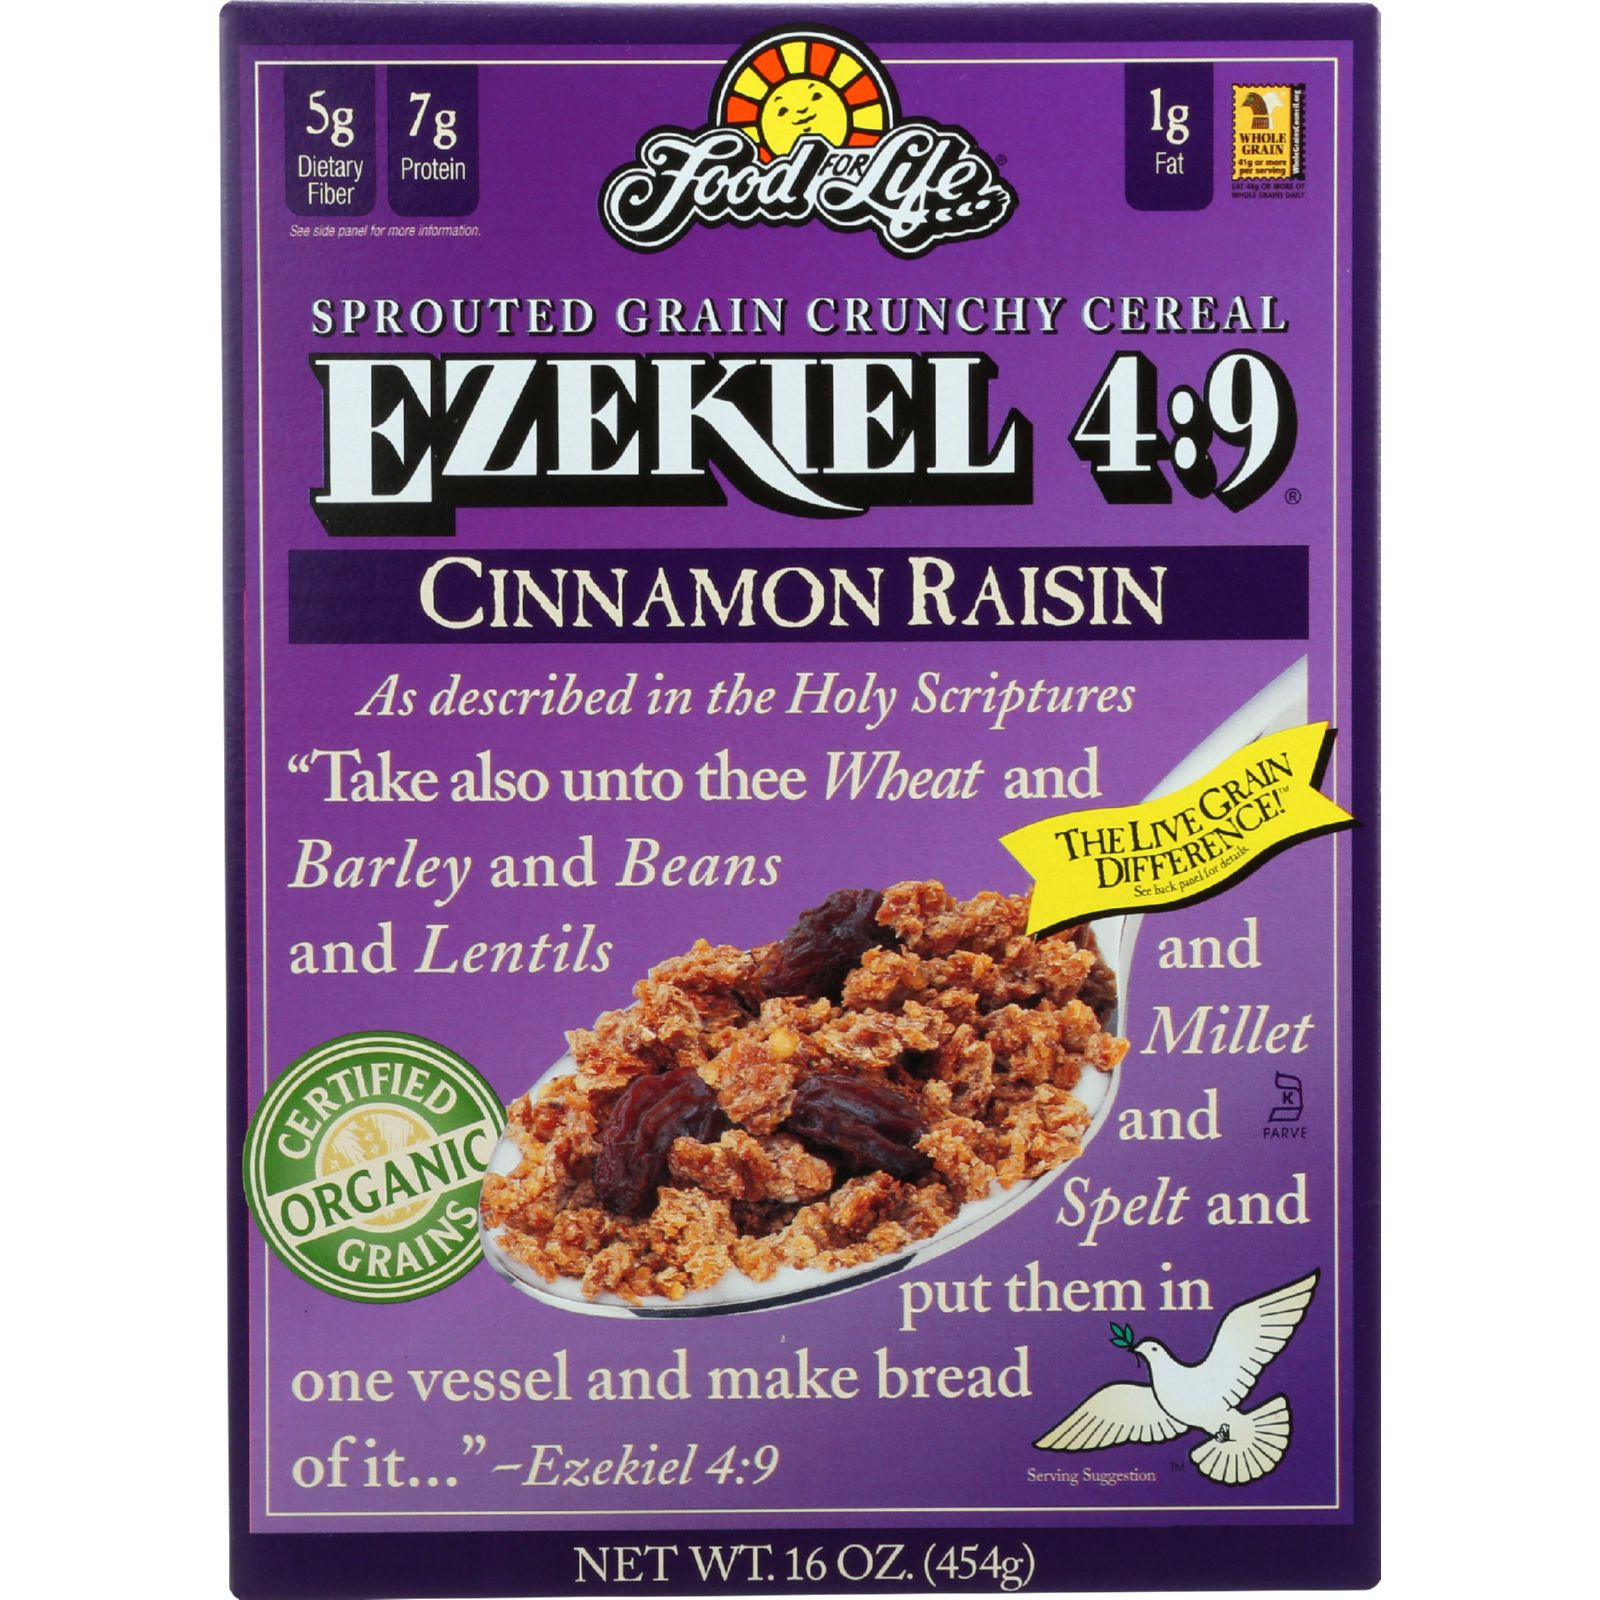 Food For Life Baking Co. Cereal - Organic - Ezekiel 4-9 -...